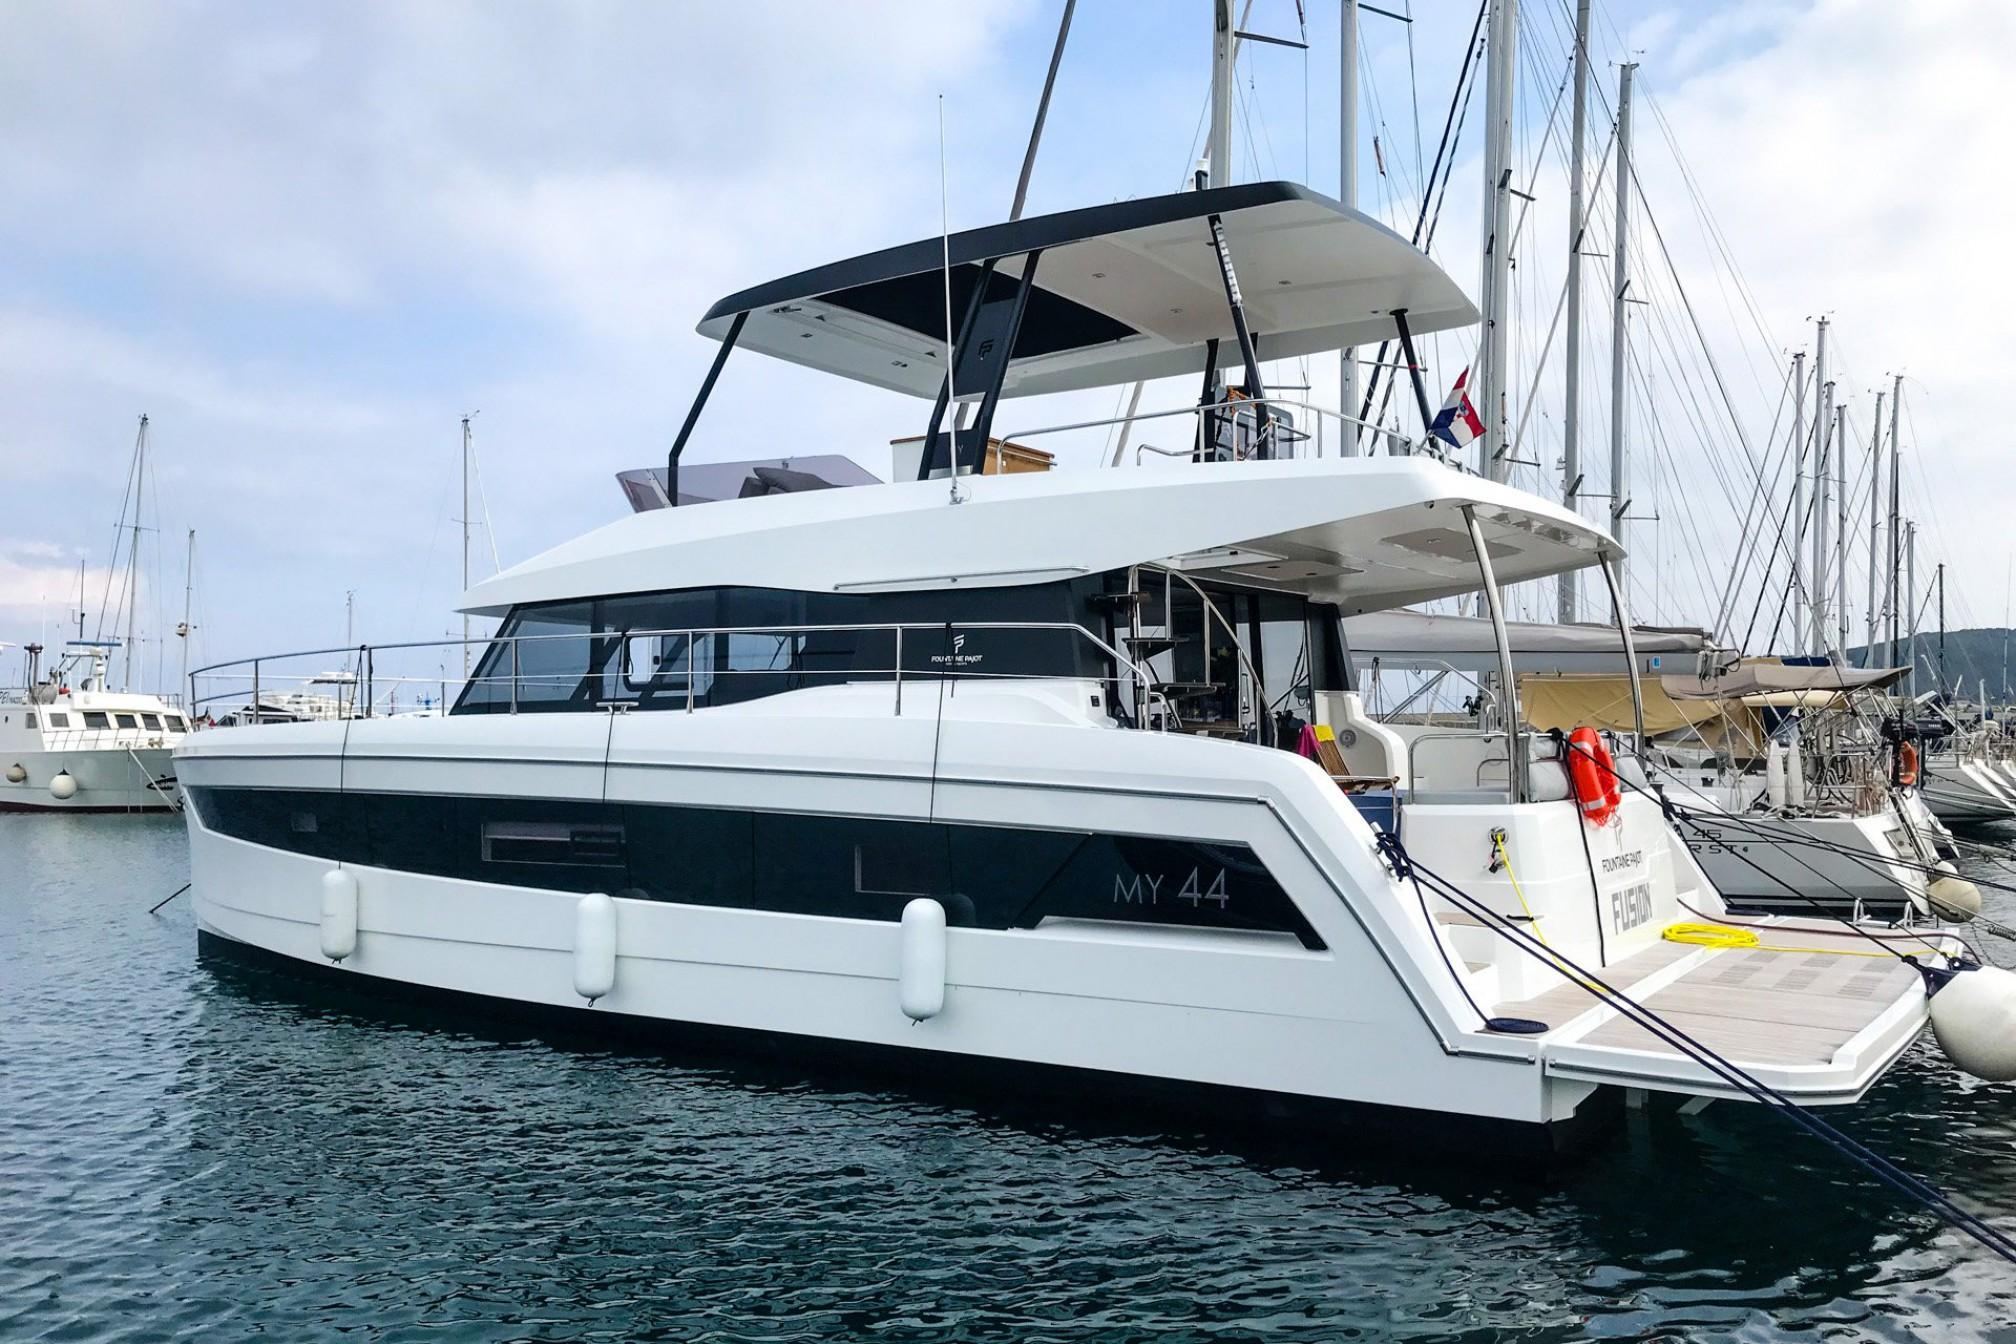 Rental yacht MY 44 Maestro moored